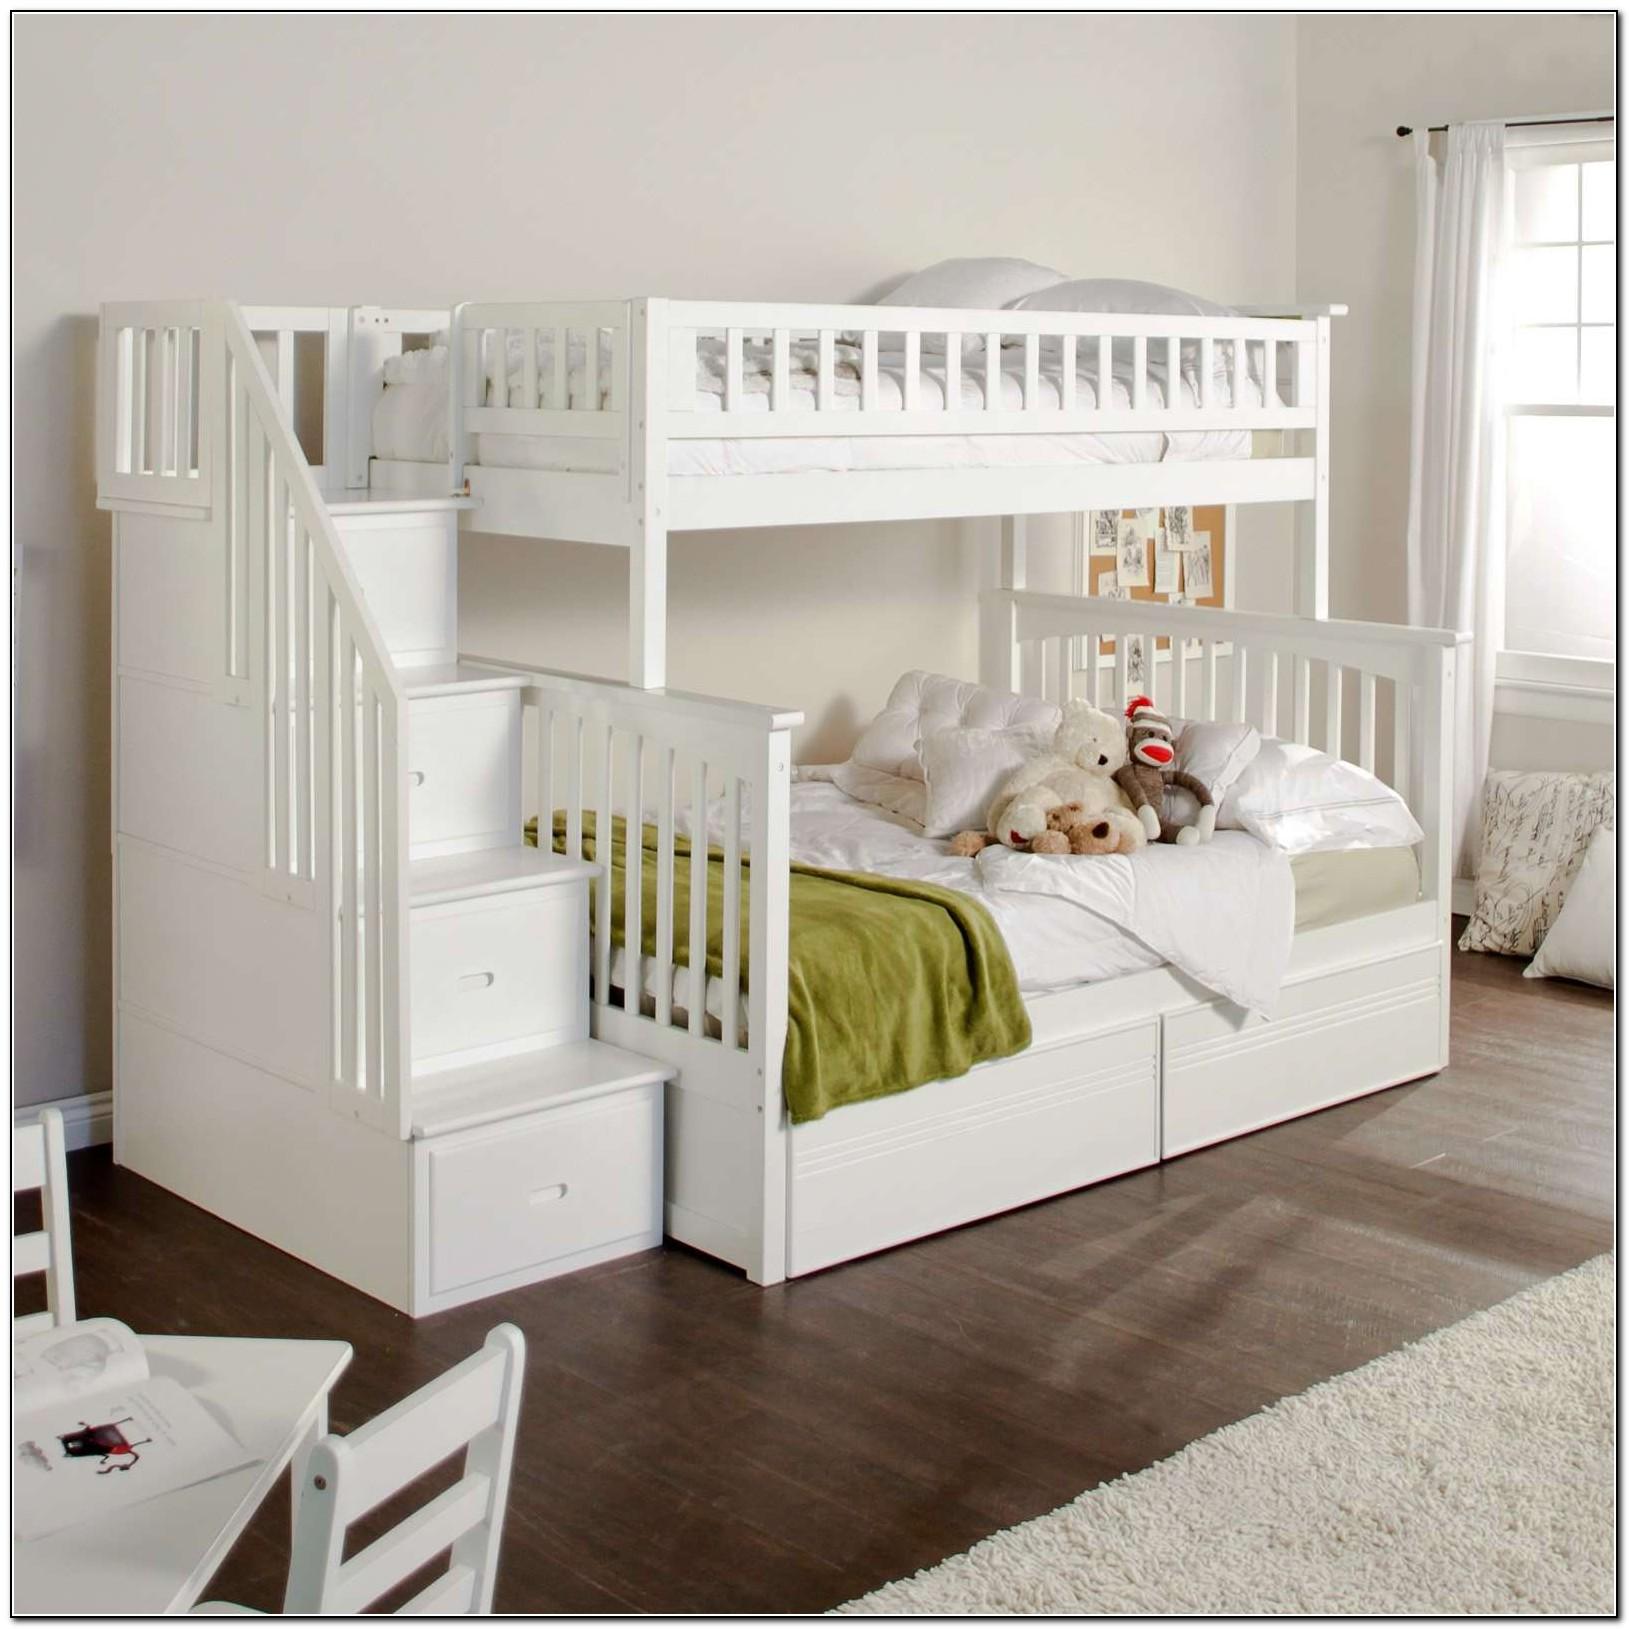 Ikea Kids Beds Australia Beds Home Design Ideas